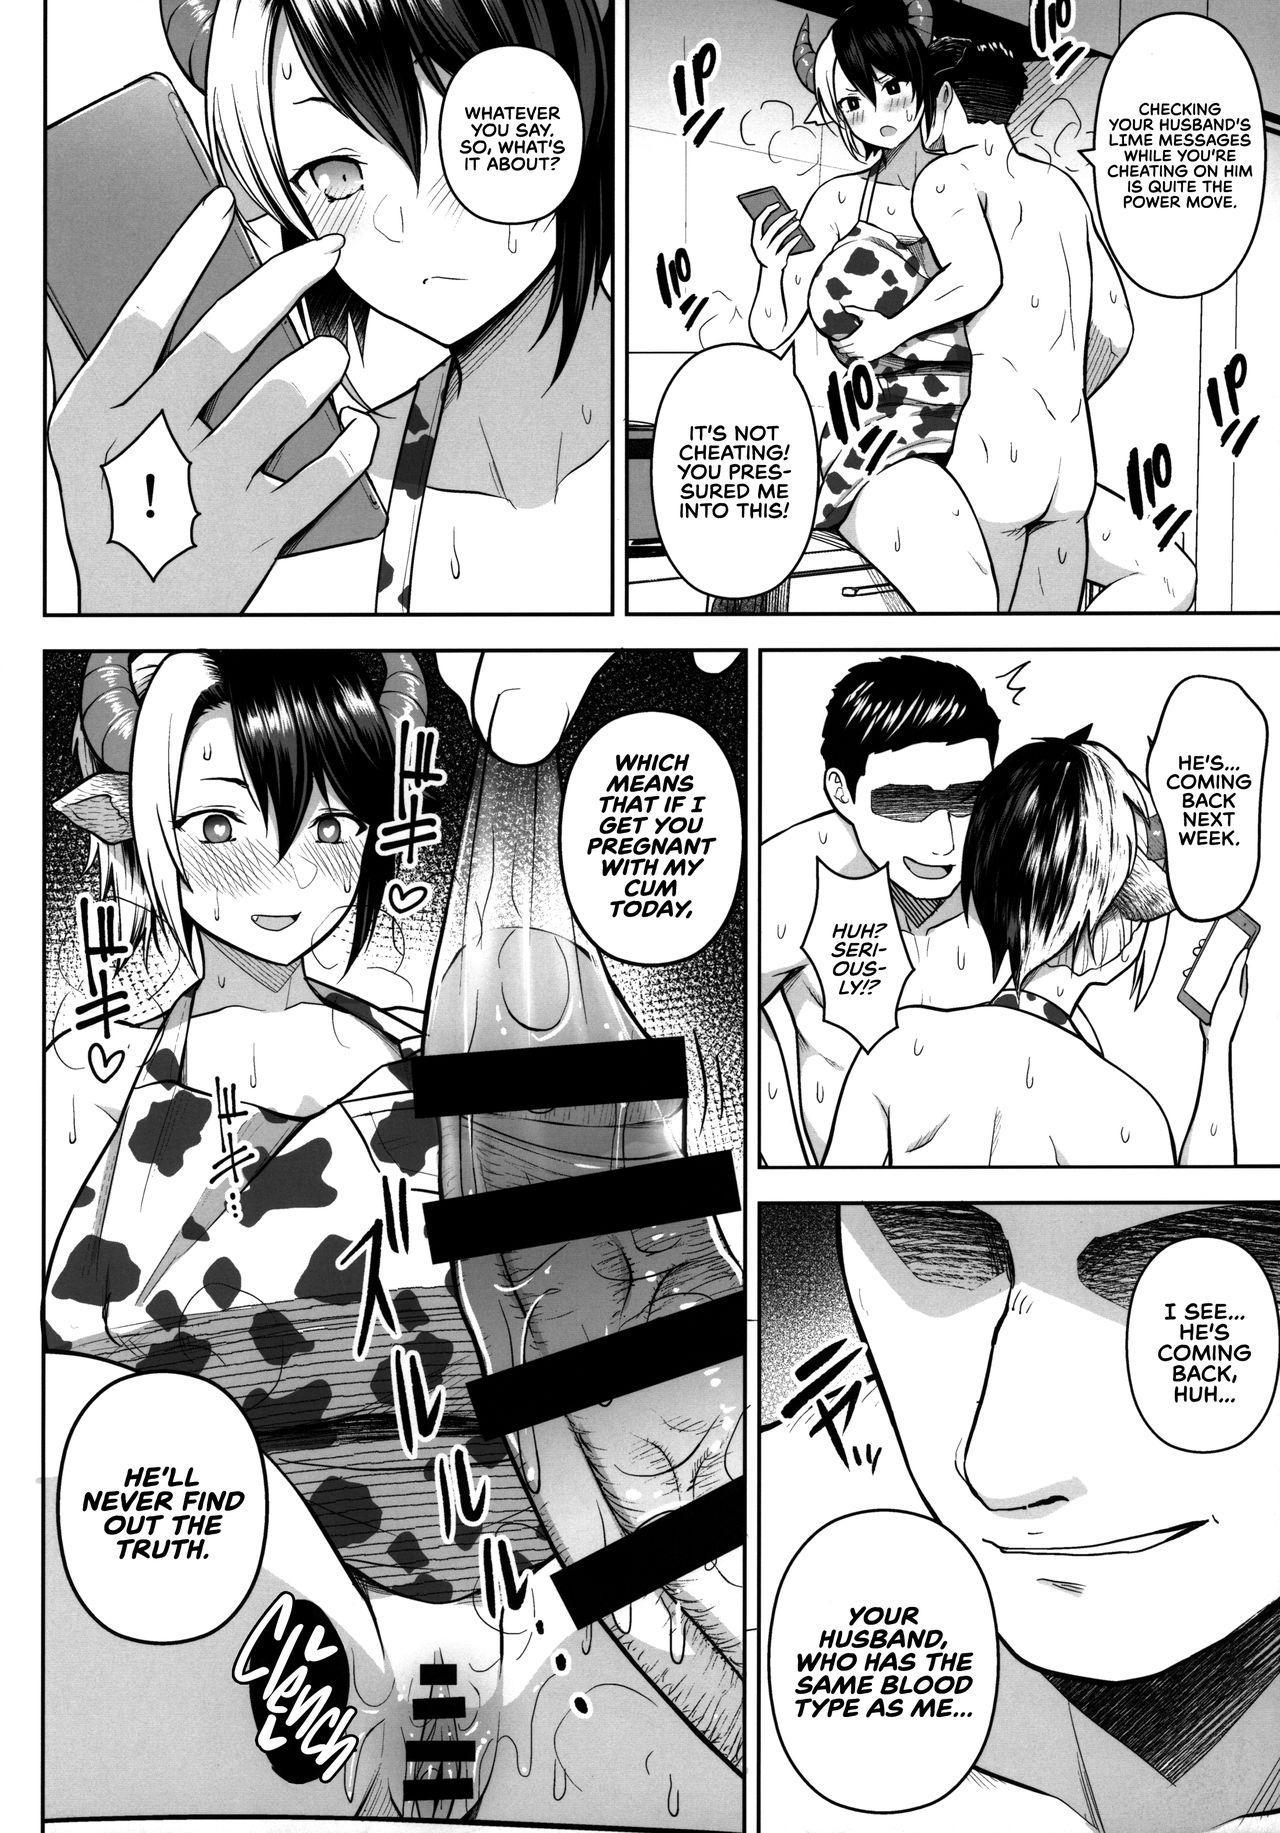 Oku-san no Oppai ga Dekasugiru noga Warui! 2 | It's Your Fault for Having Such Big Boobs, Miss! 2 27